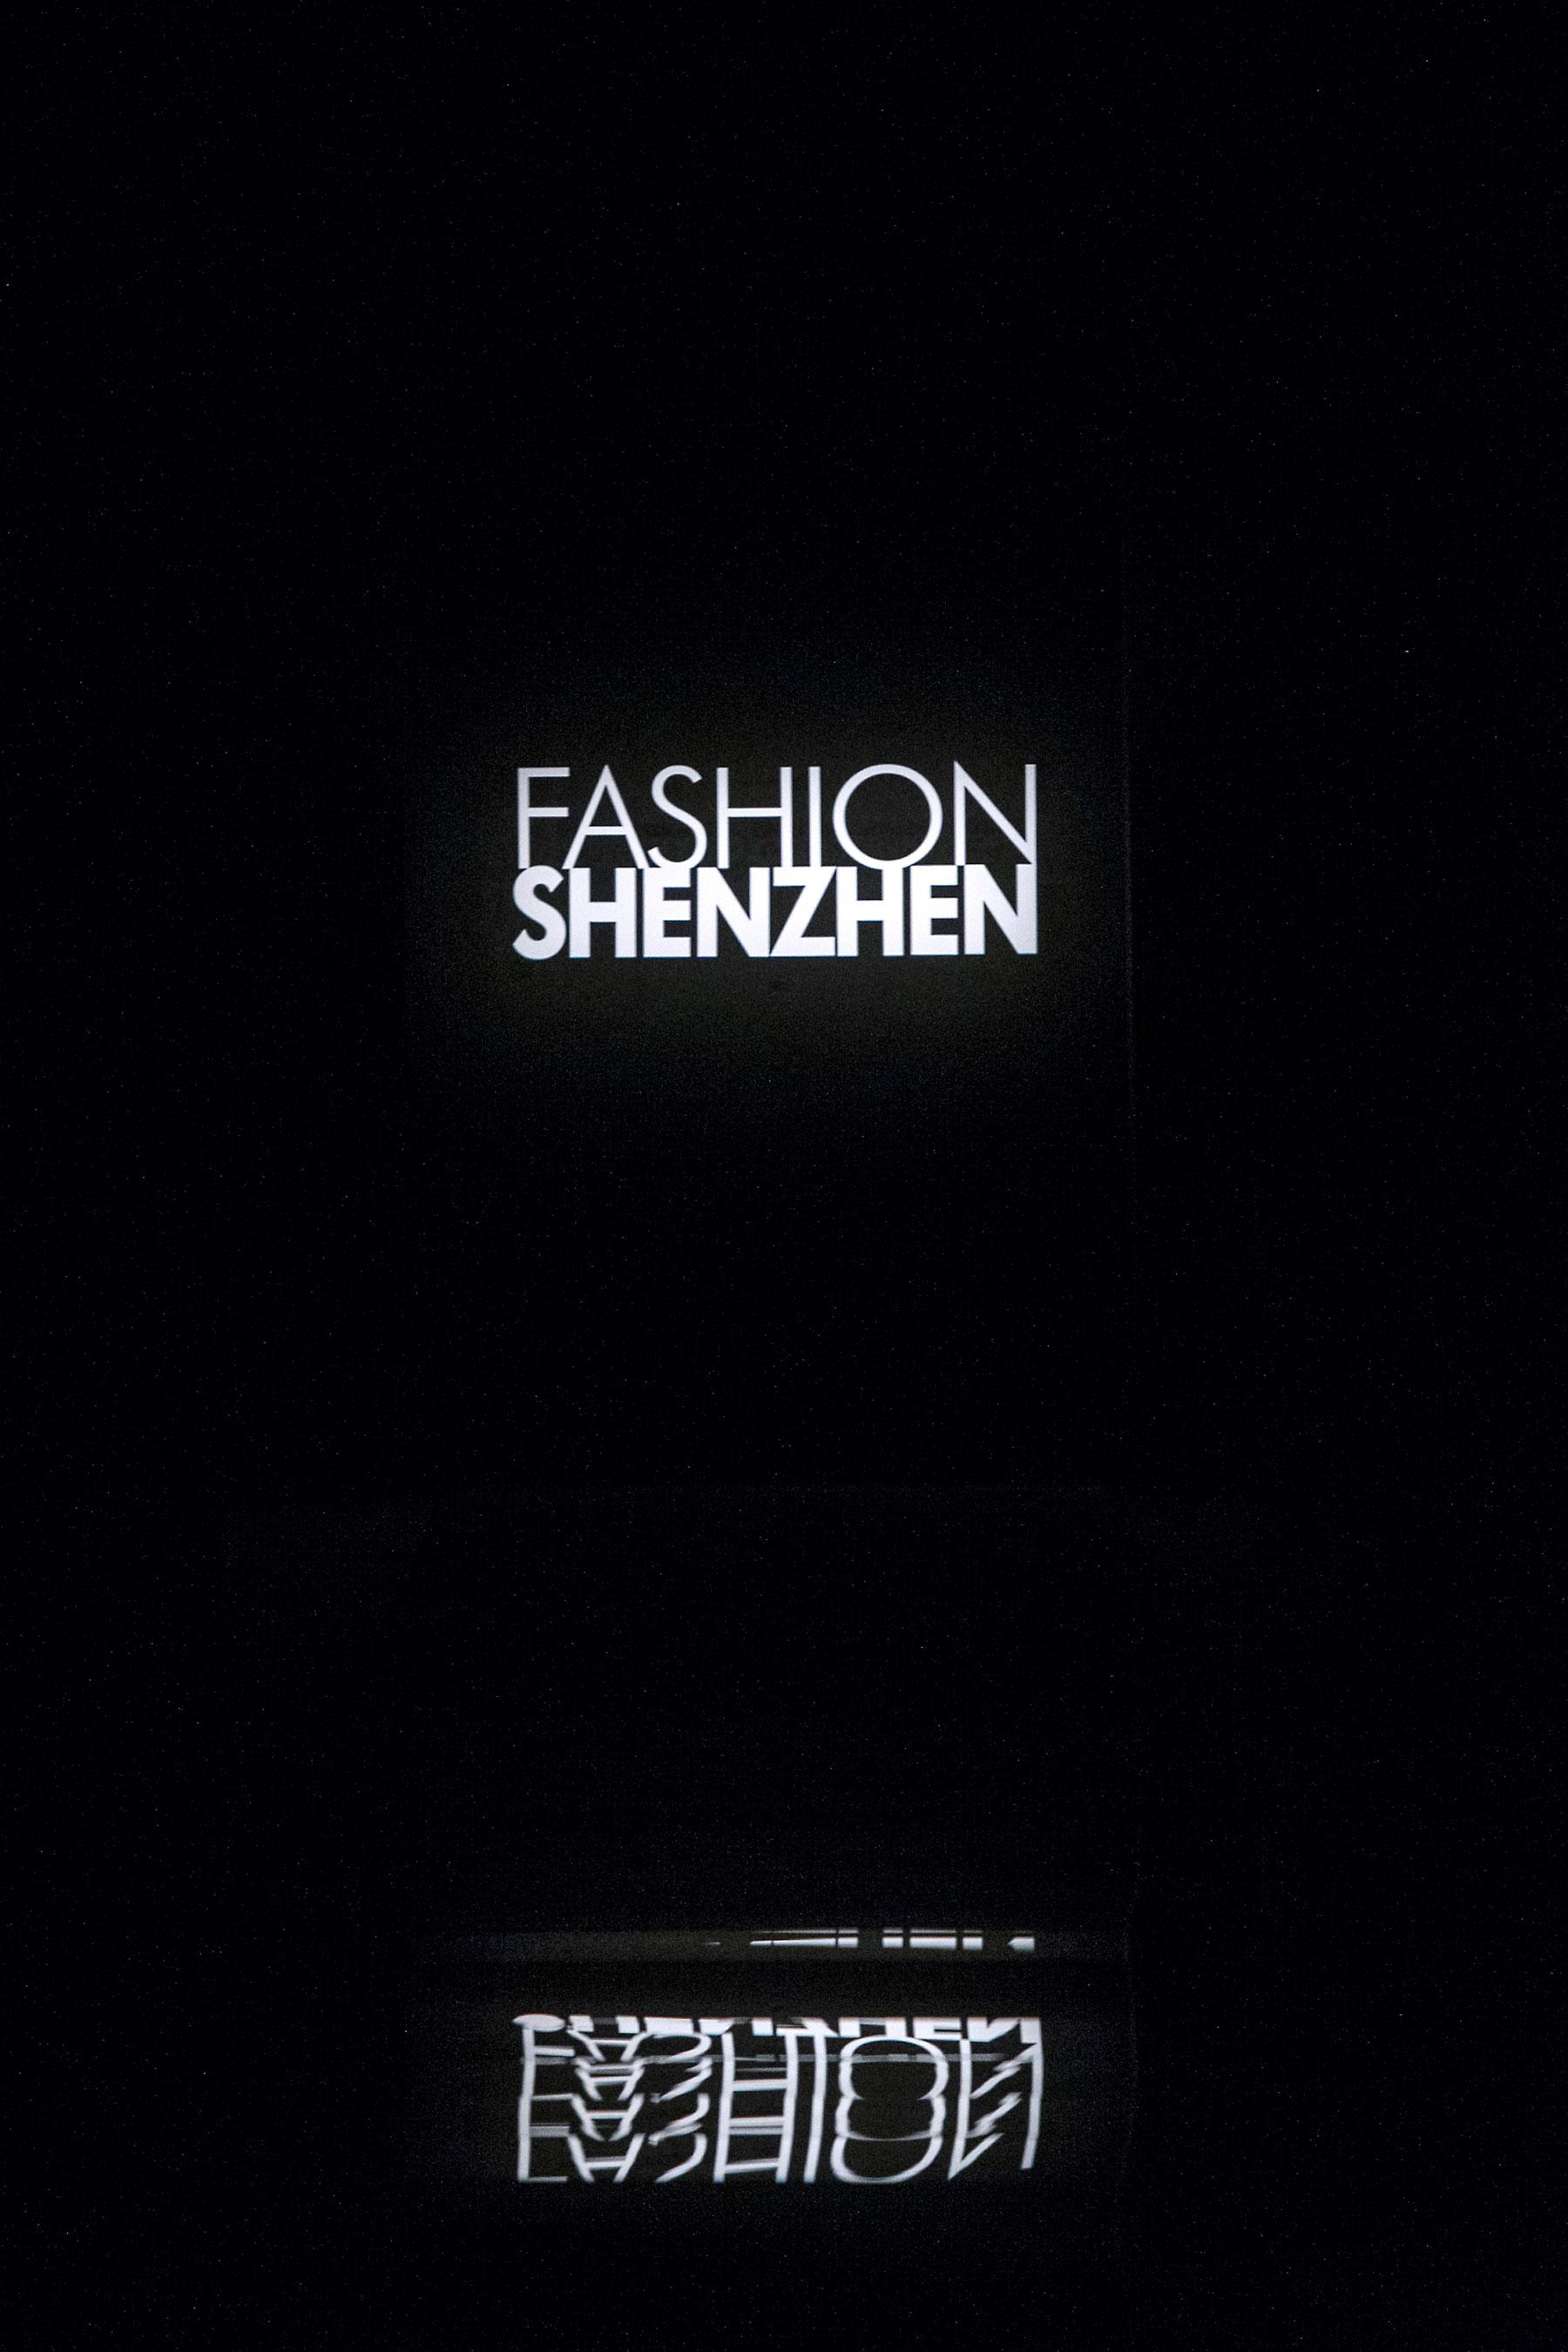 Fashion Shenzhen atm RS17 7383